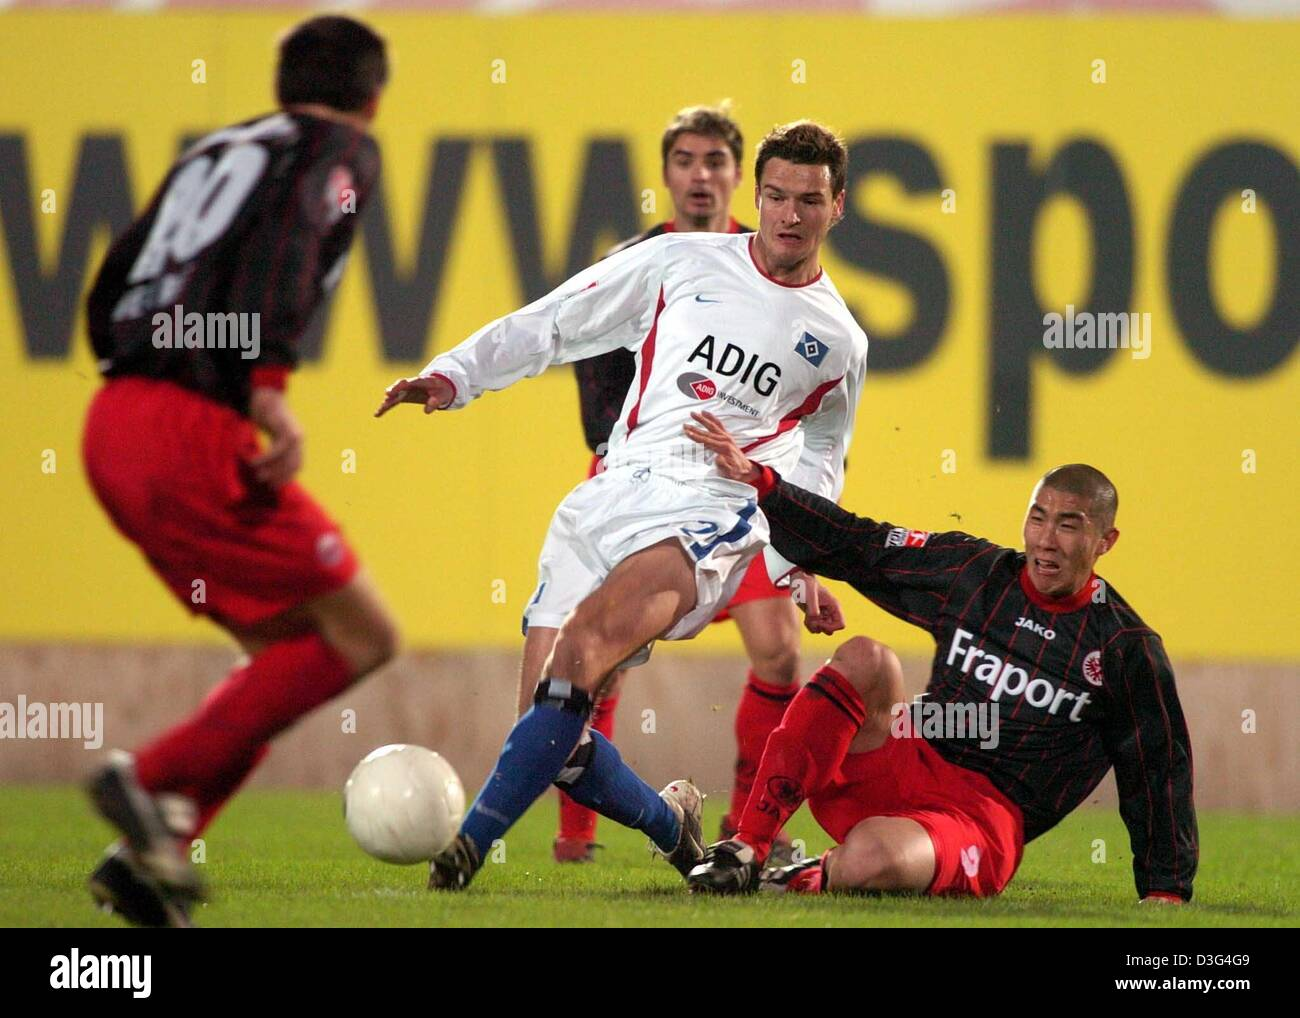 (dpa) - Eintracht's Du-Ri Cha (R) vies for the ball with Hamburg's Marcel Maltriz (C) during the Bundesliga - Stock Image